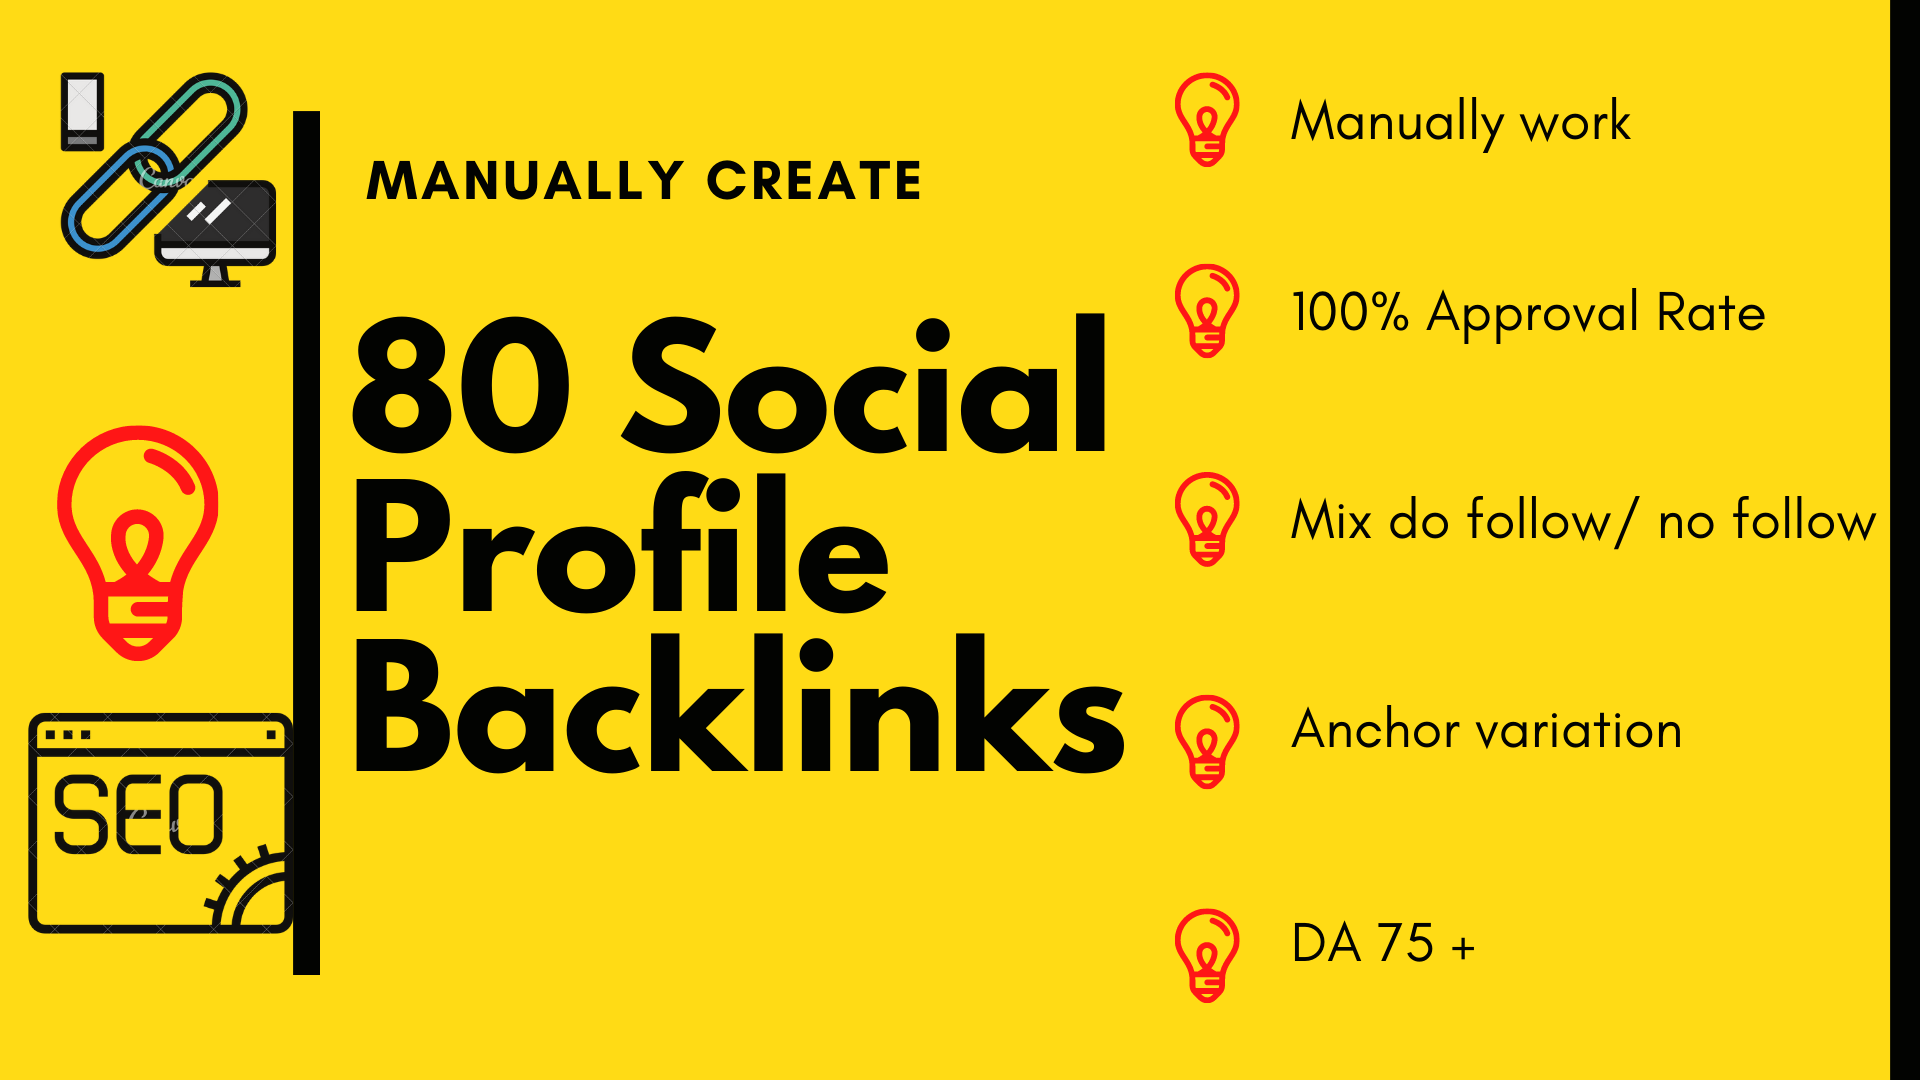 80 manually create high authority social profile backlinks